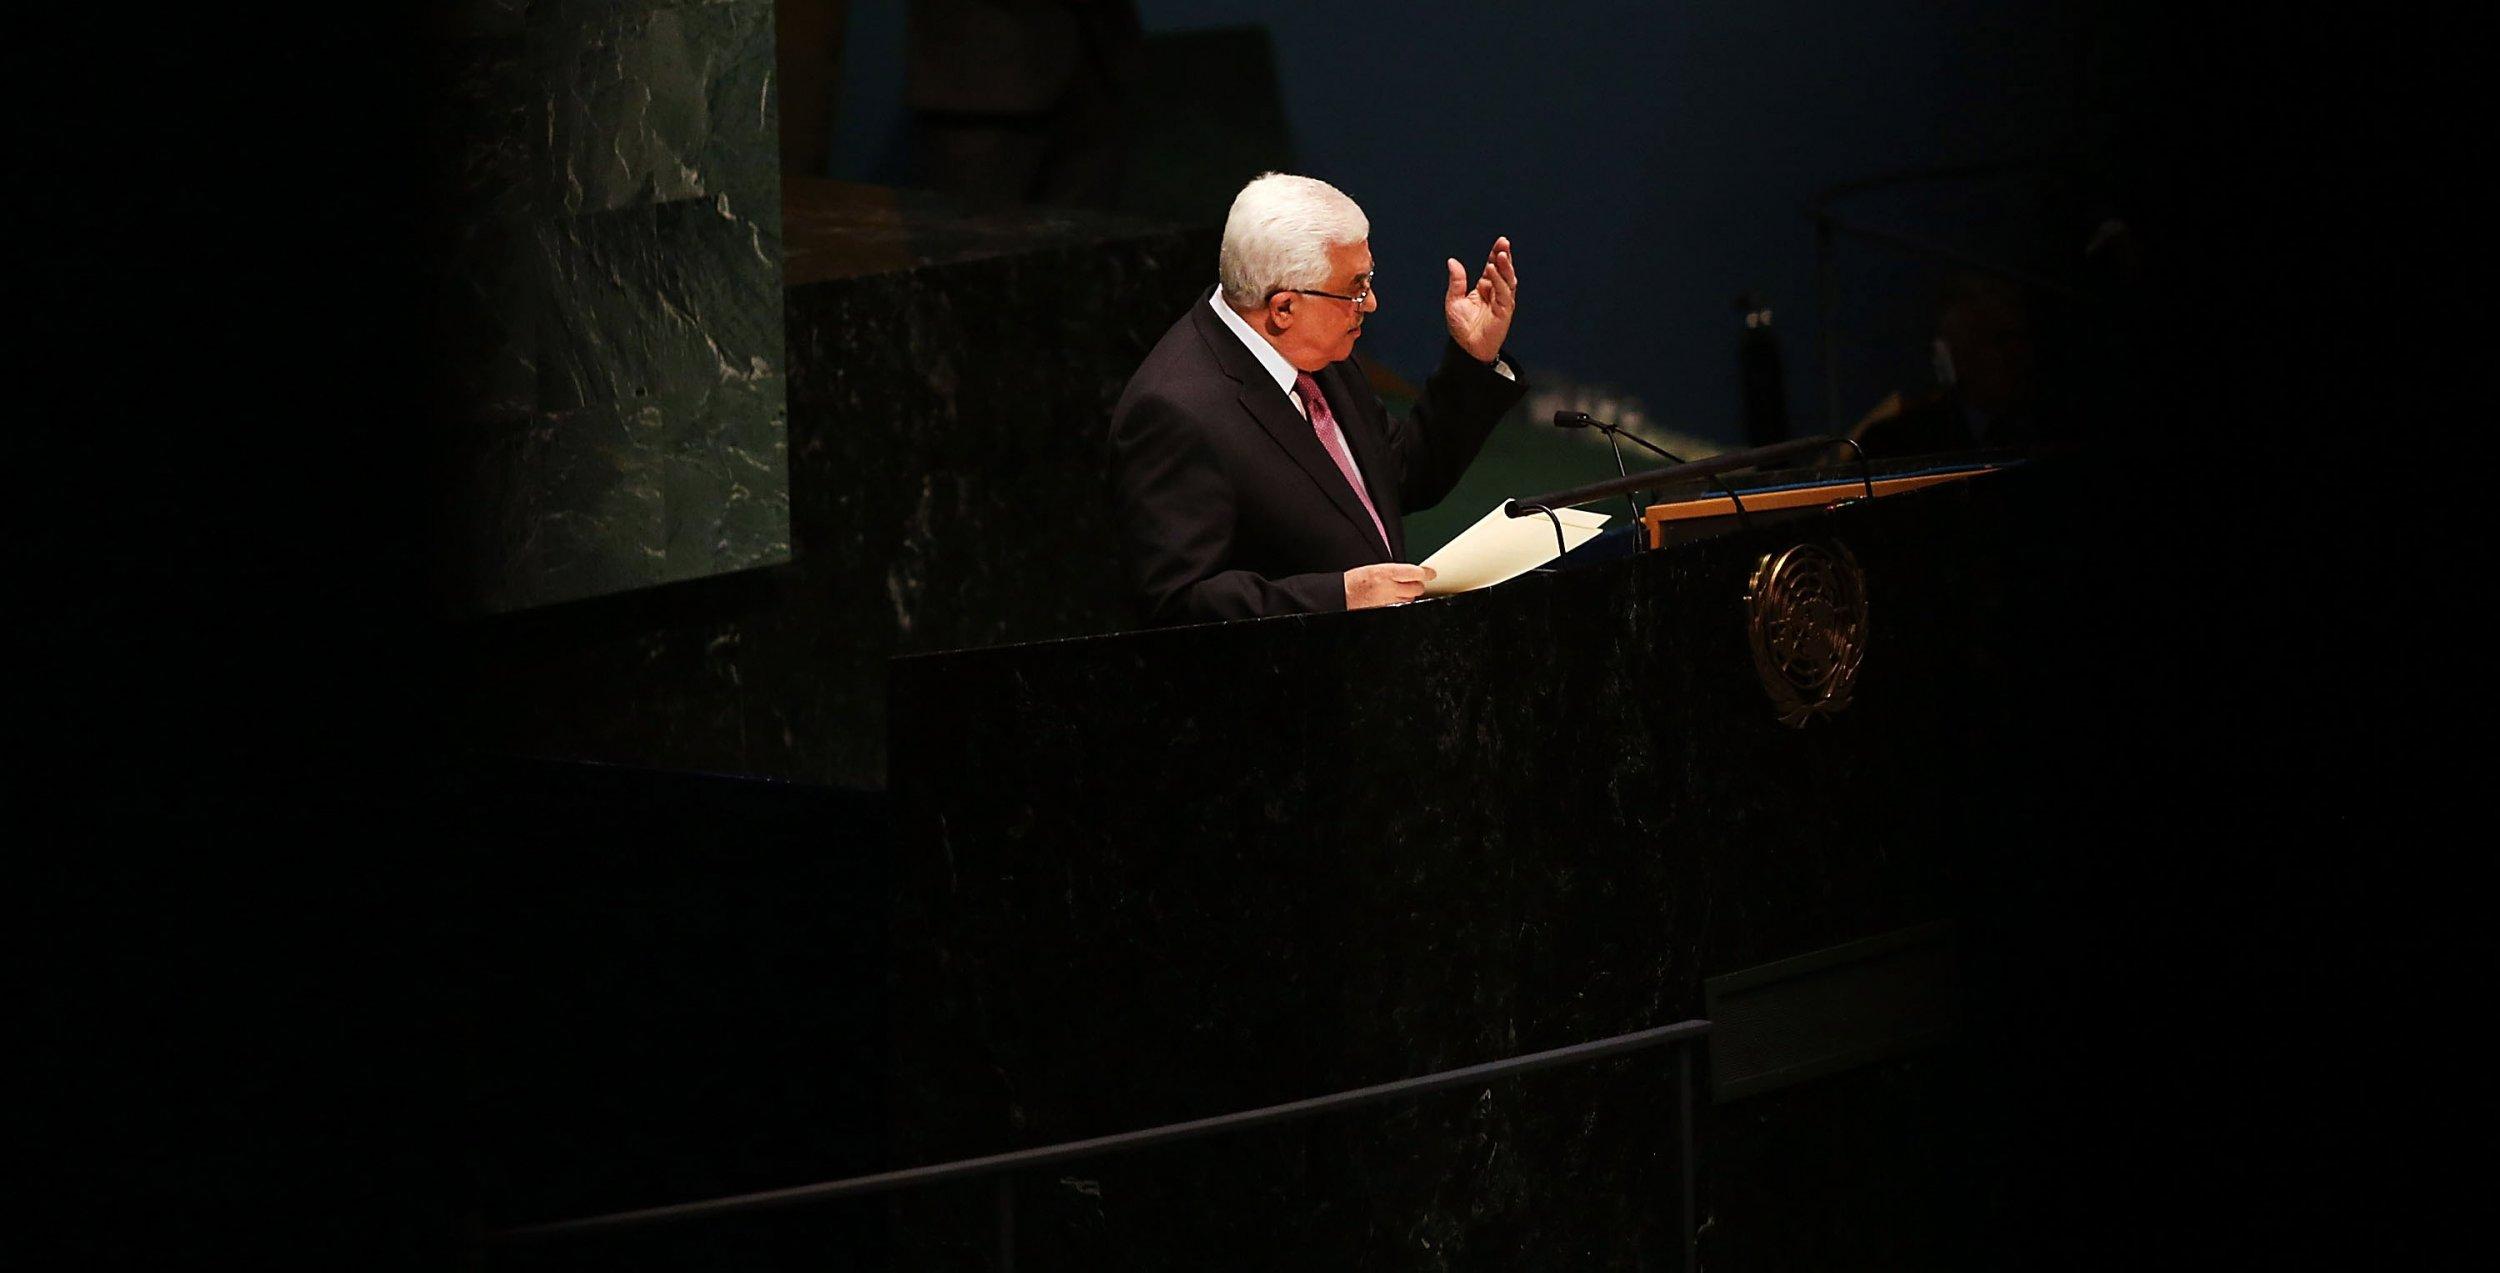 Mahmoud Abbas Obama Israel Palestinian Territories West Bank